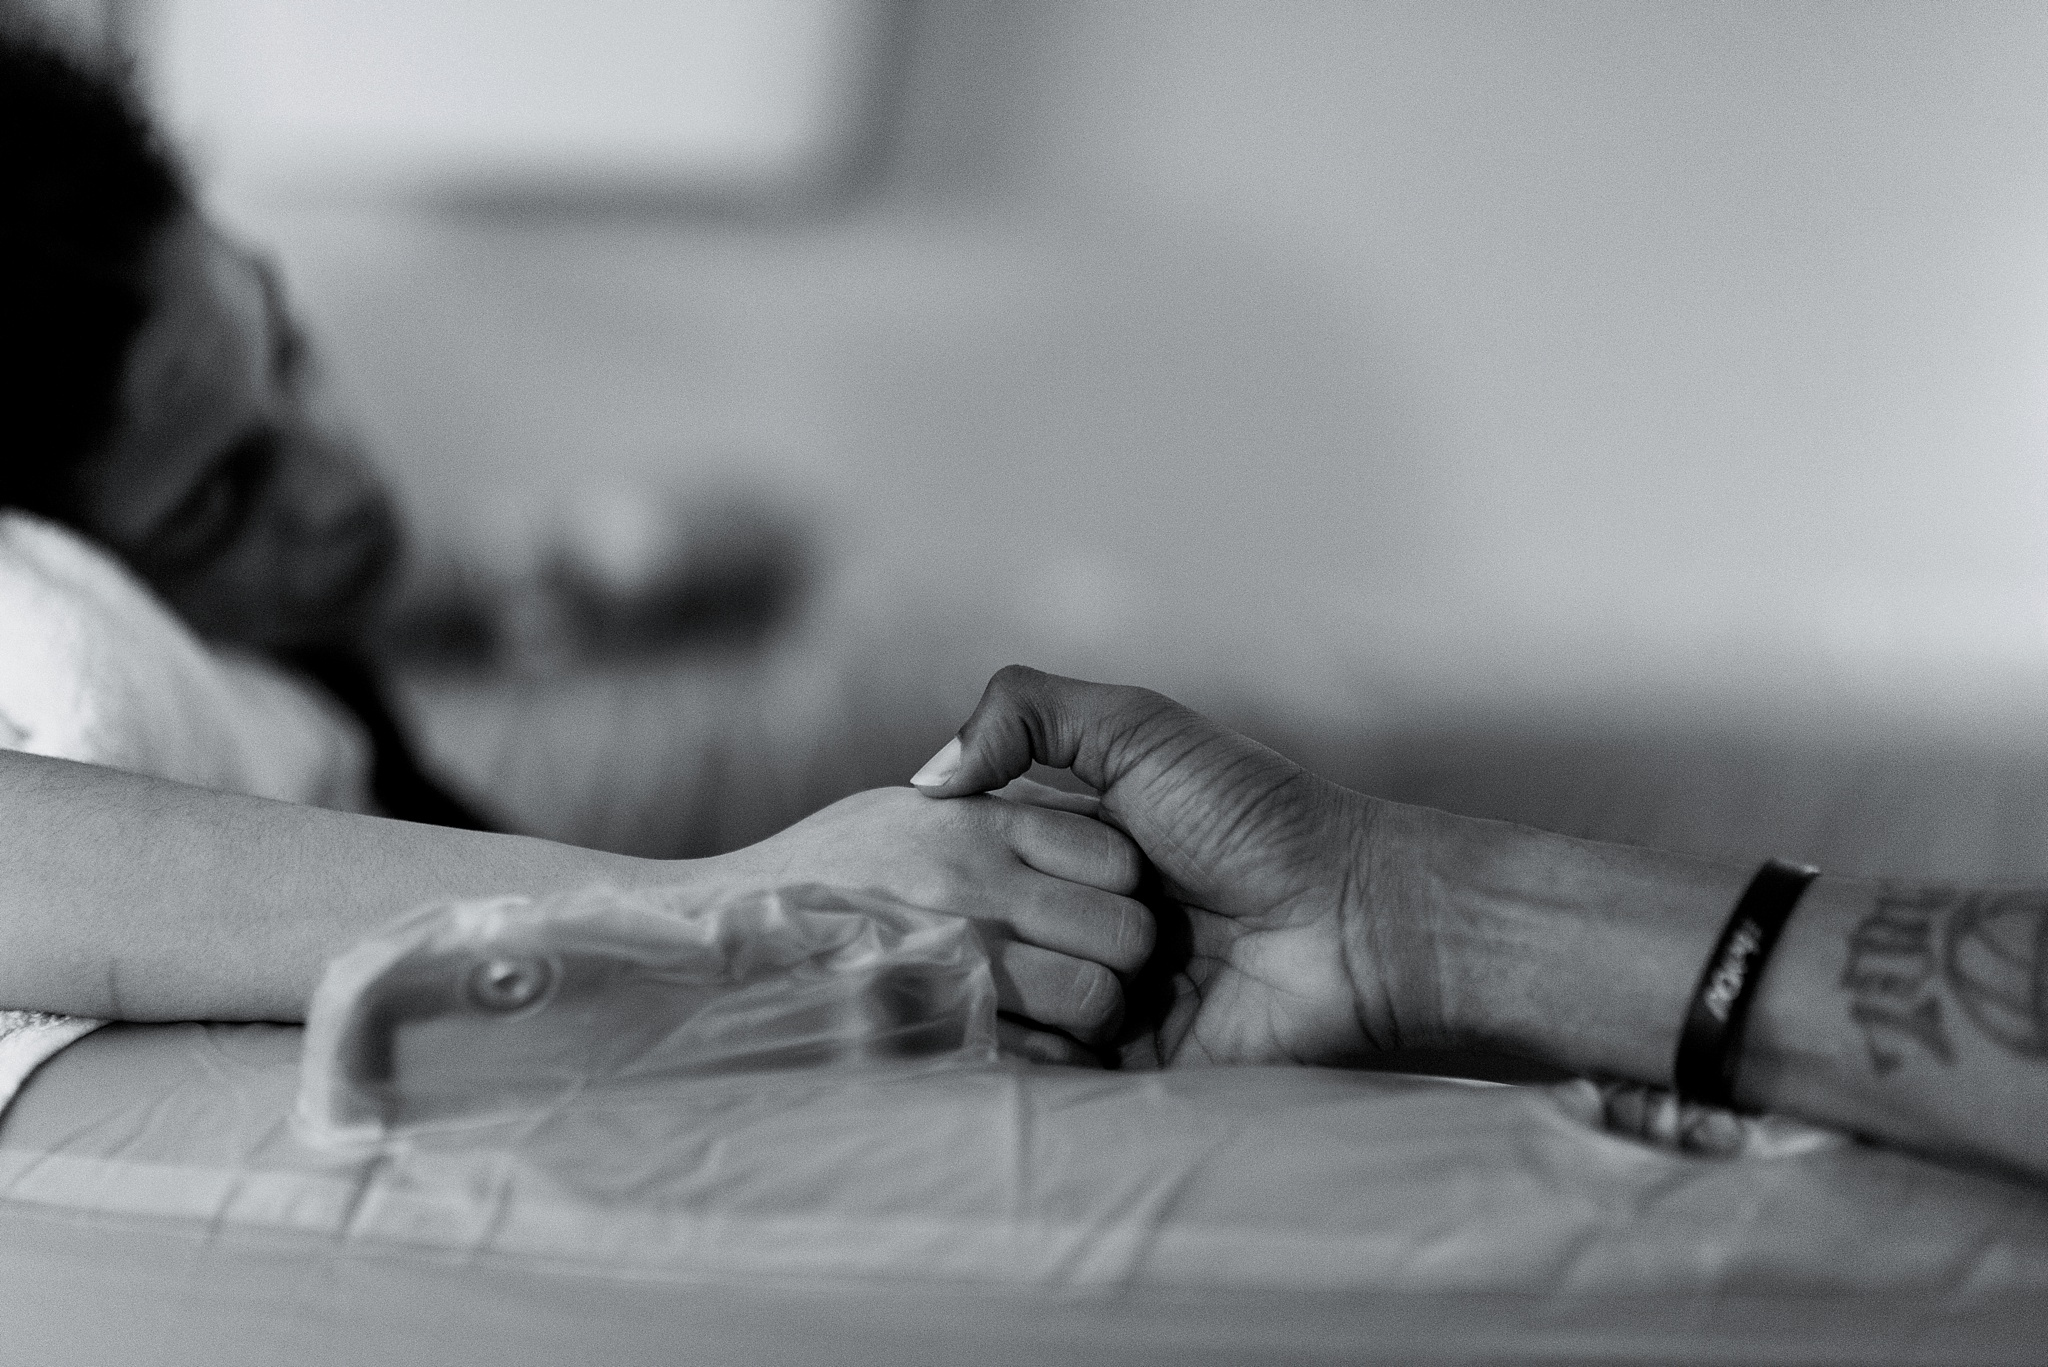 atlanta-medical-center-birth-photographer-nykole-smith-239.jpg